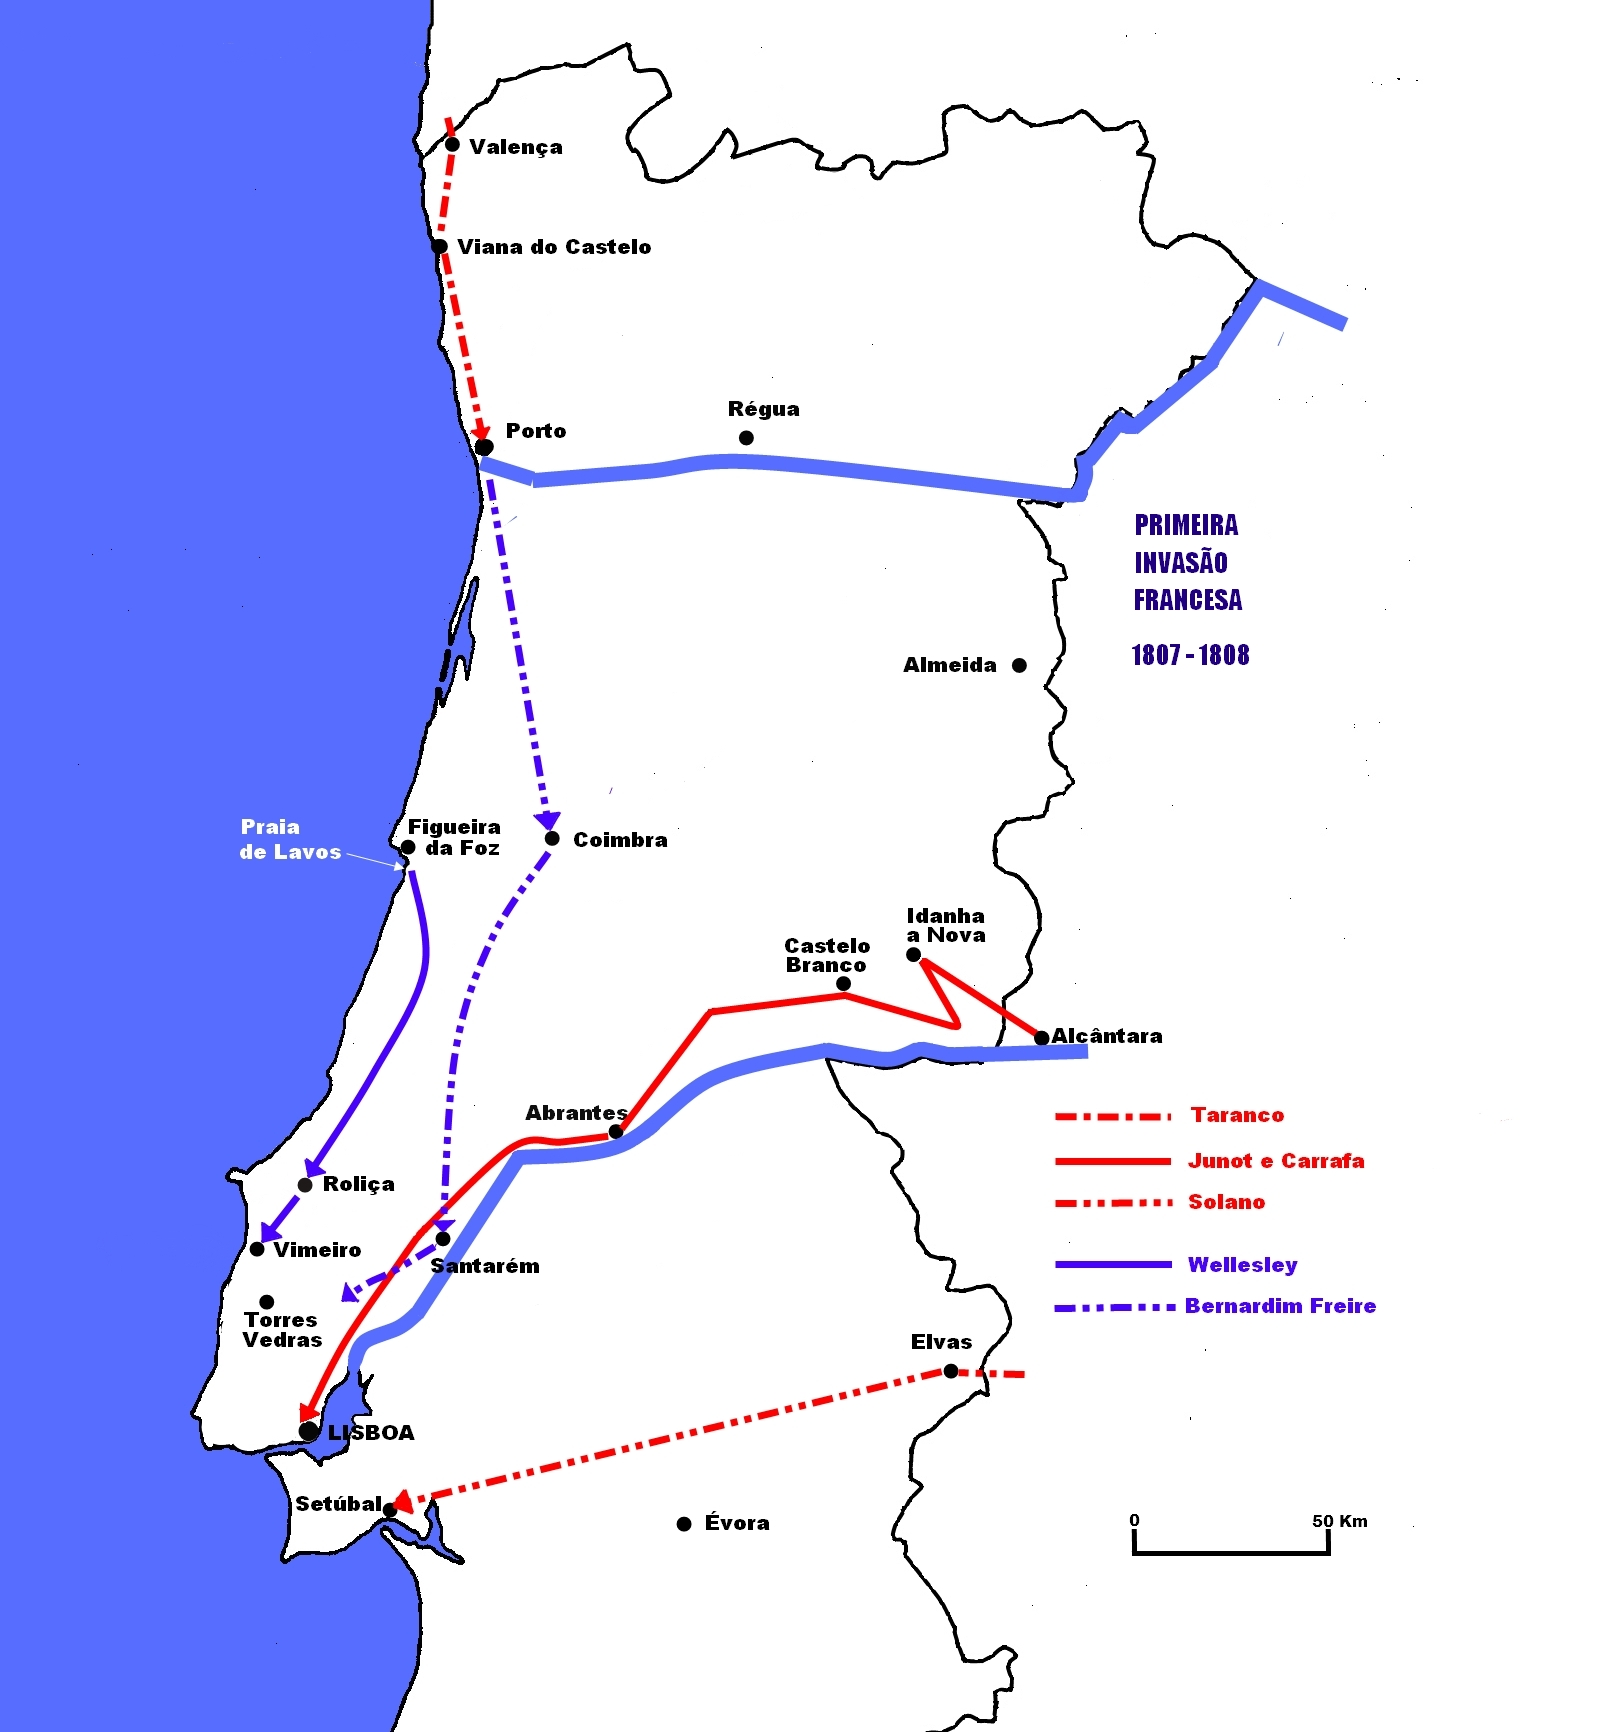 mapa de portugal itenerarios File:Mapa da 1ª invasão francesa.   Wikimedia Commons mapa de portugal itenerarios